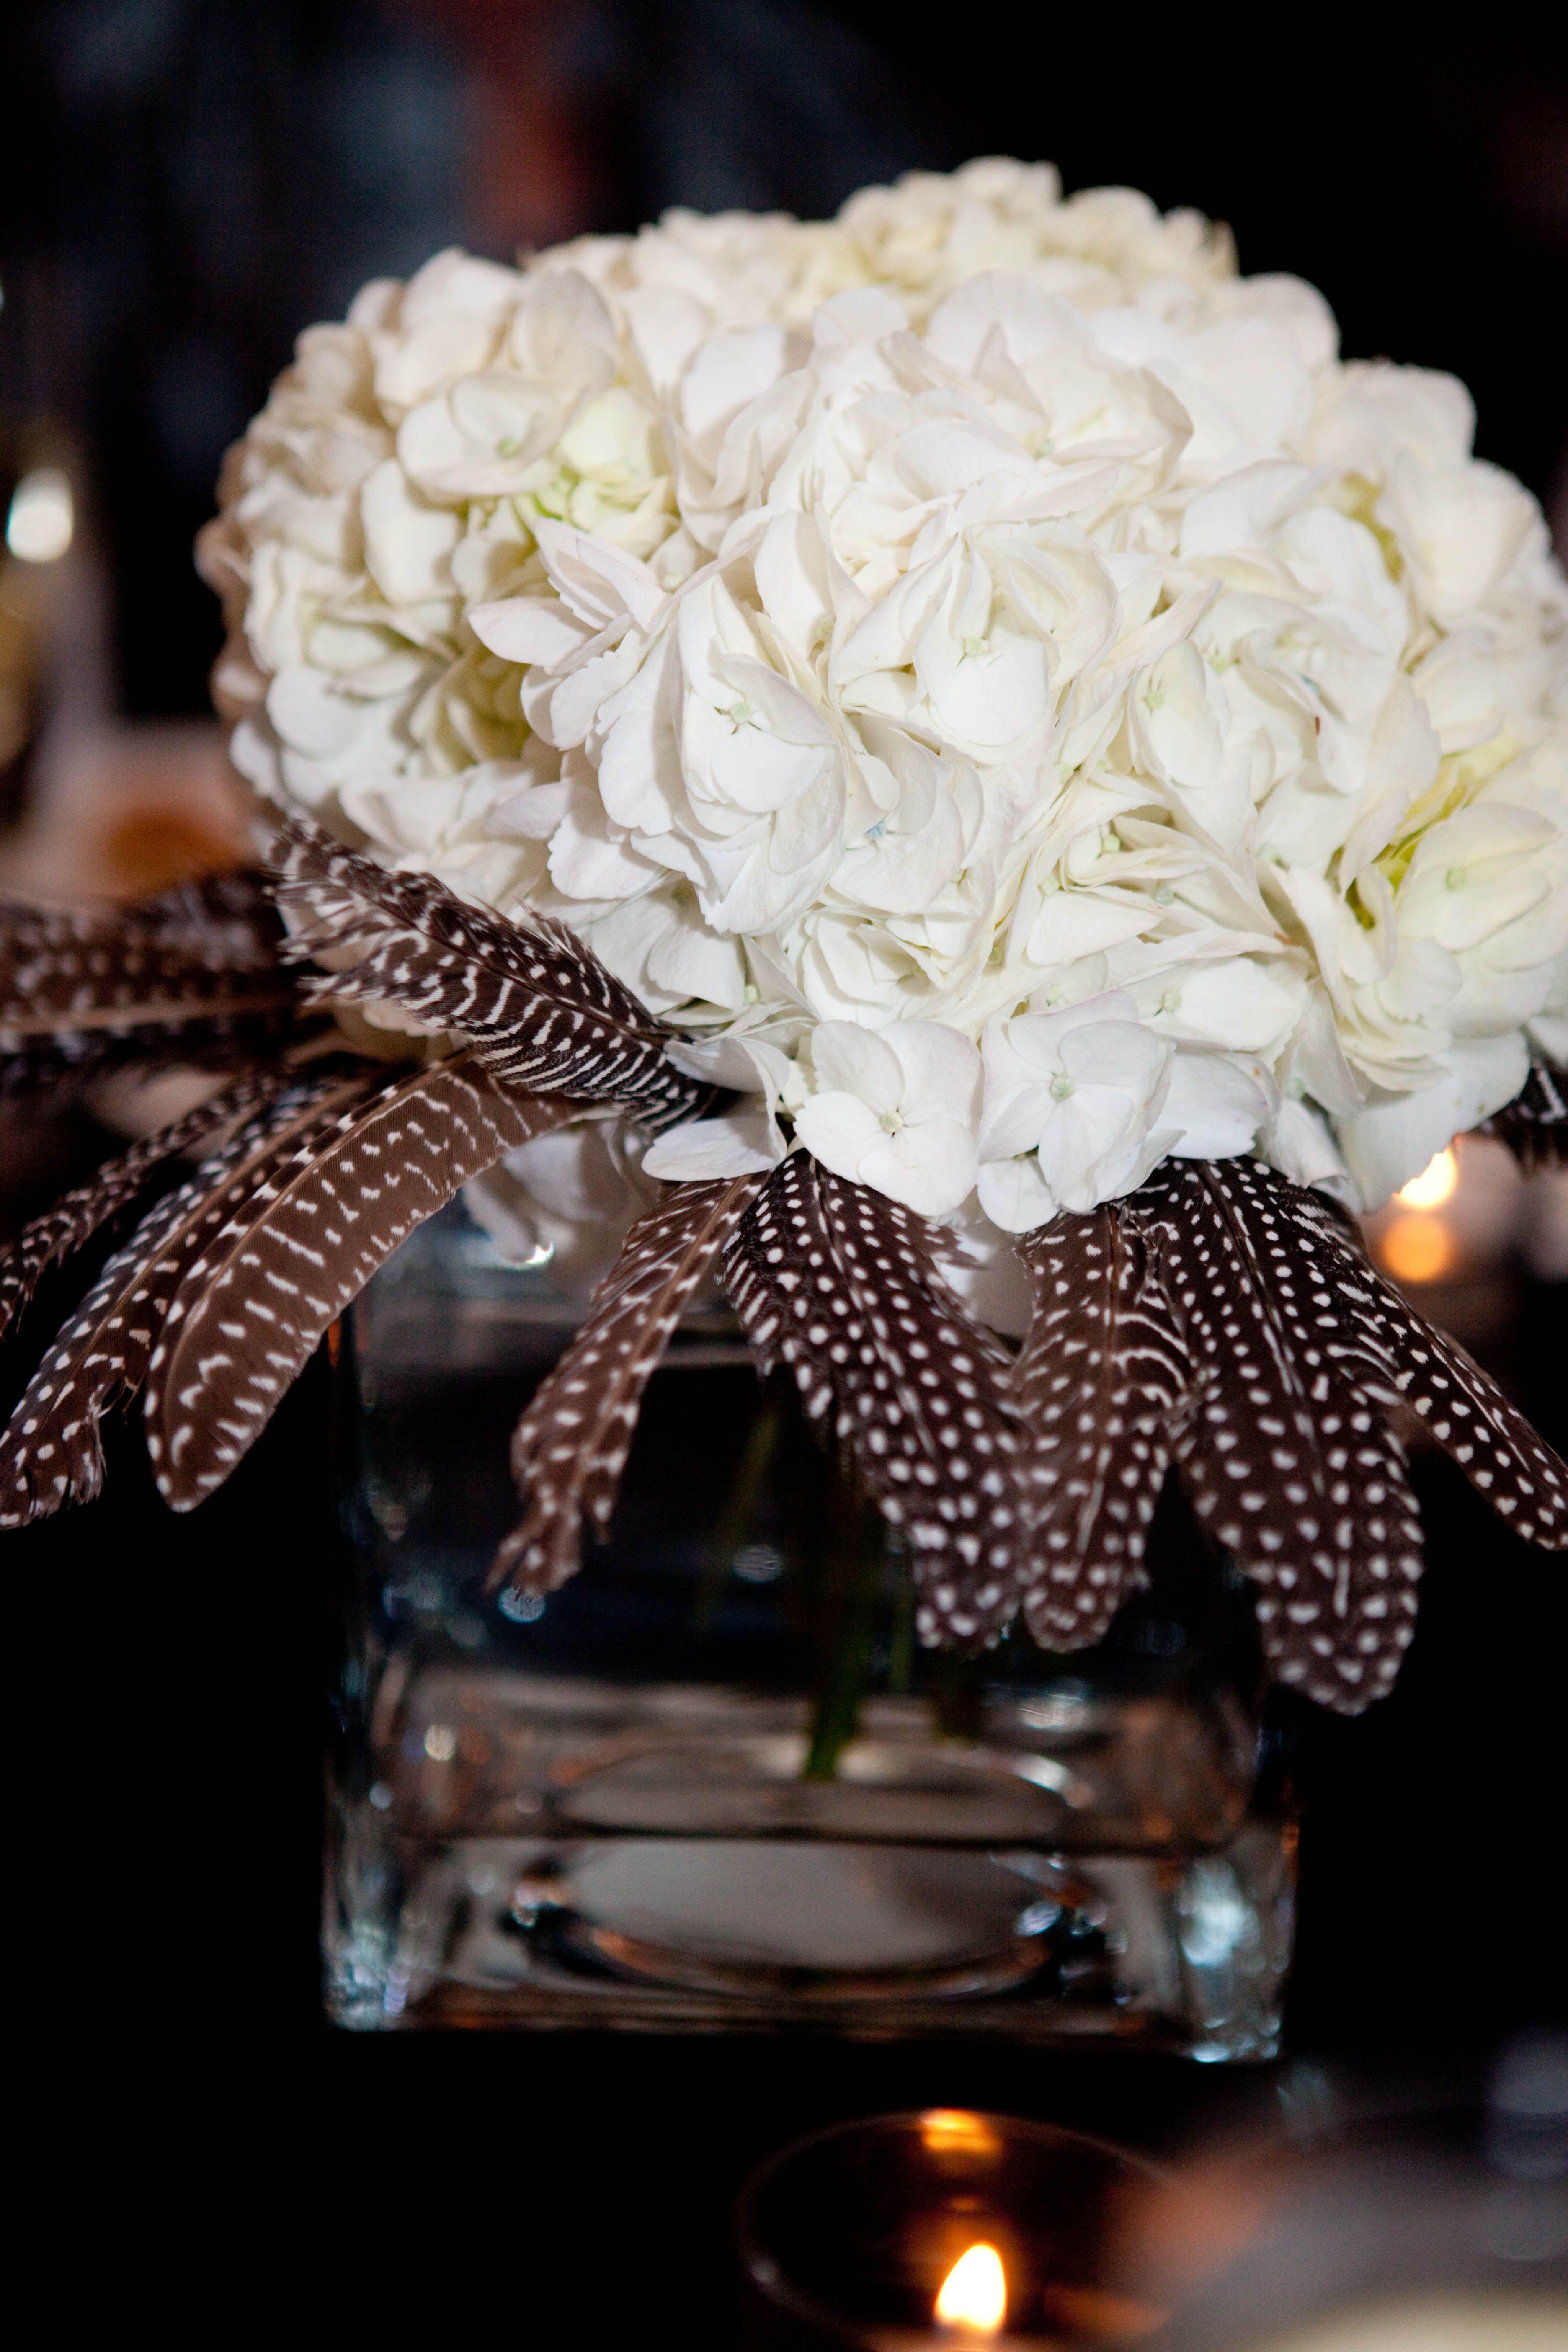 Kiwi Fleur Floral Events Weddings Wedding Flowers Wedding Flowers